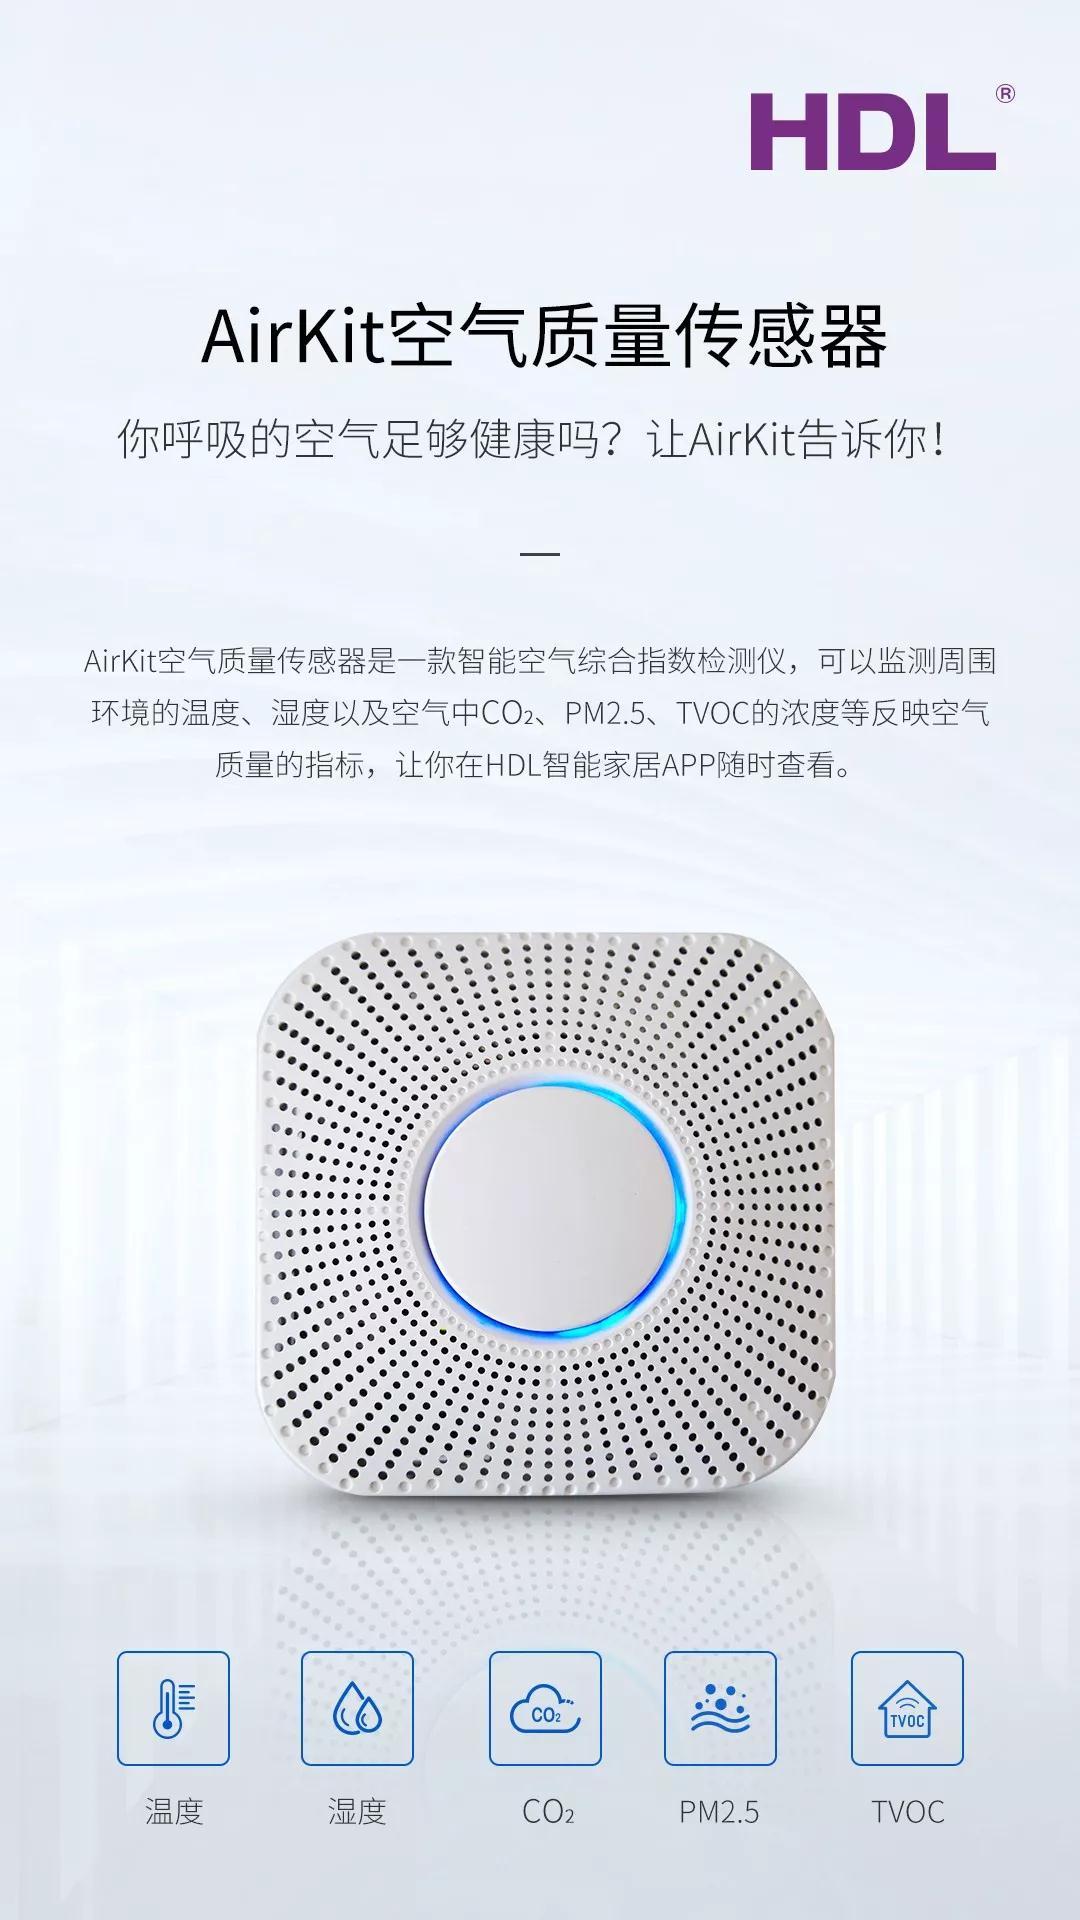 HDL智能家居新品发布:AirKit空气质量传感器